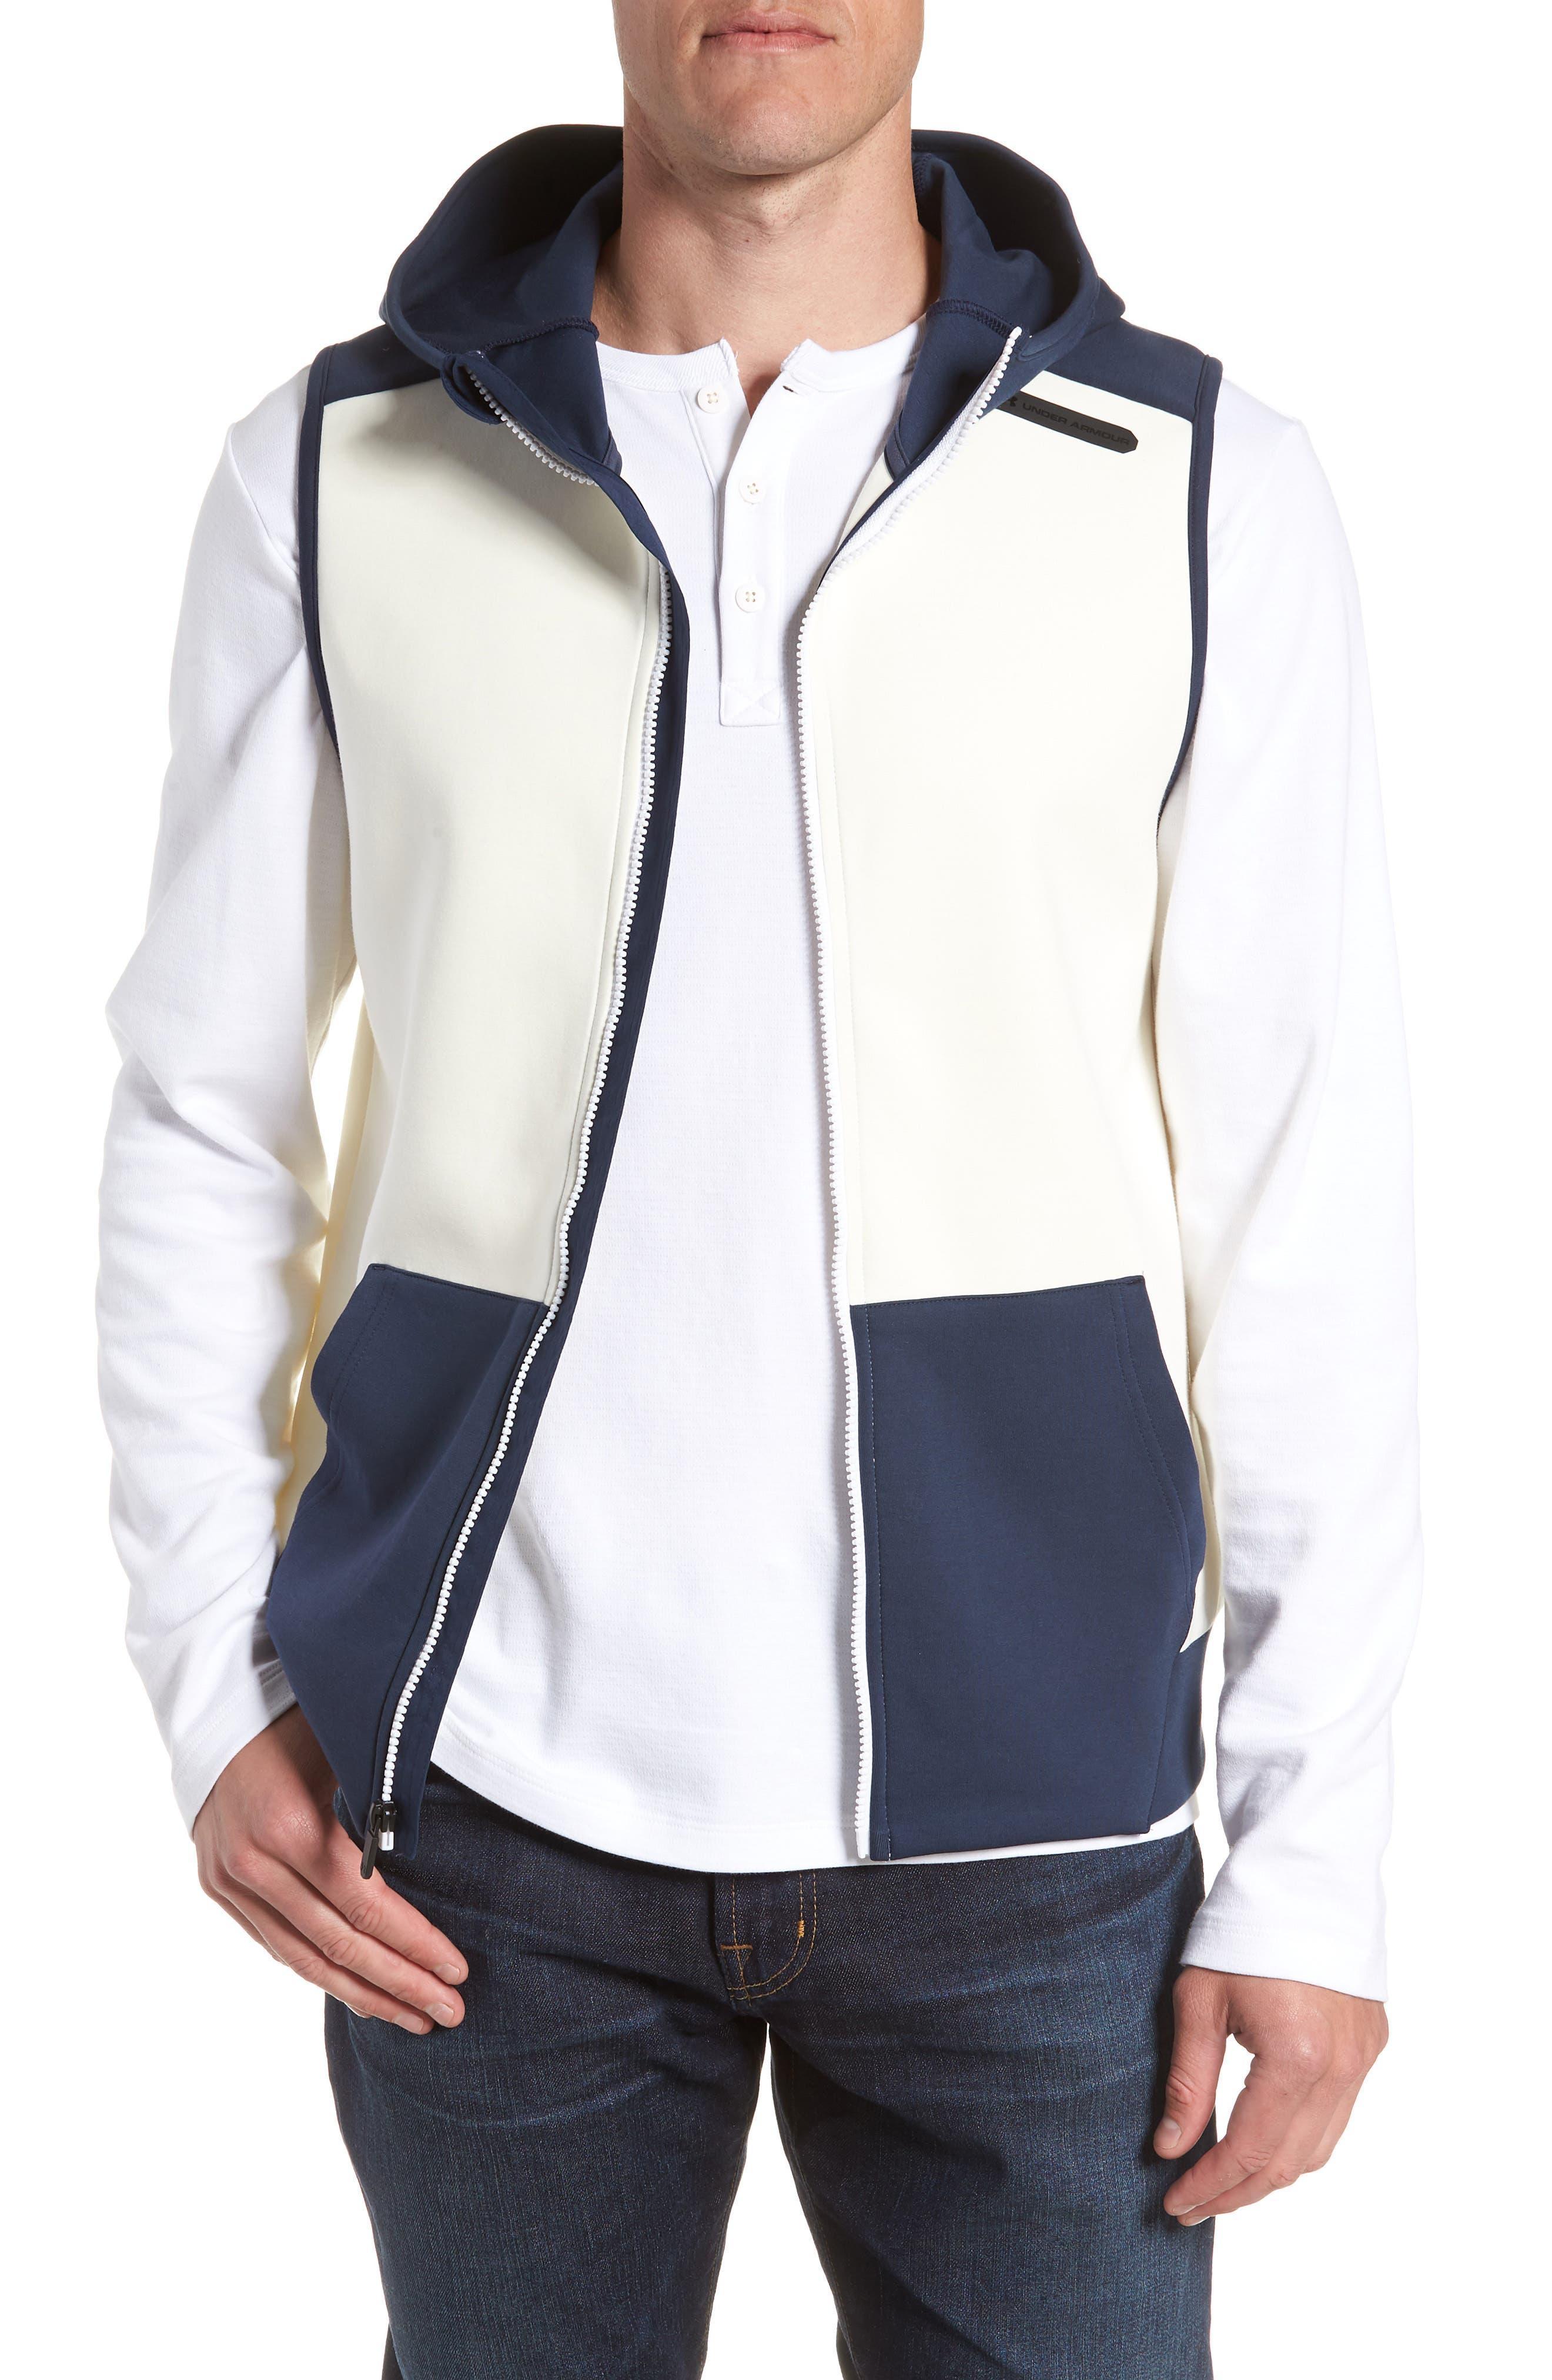 Unstoppable Knit Vest,                             Main thumbnail 1, color,                             WHITE / SUMMER NIGHT / BLACK